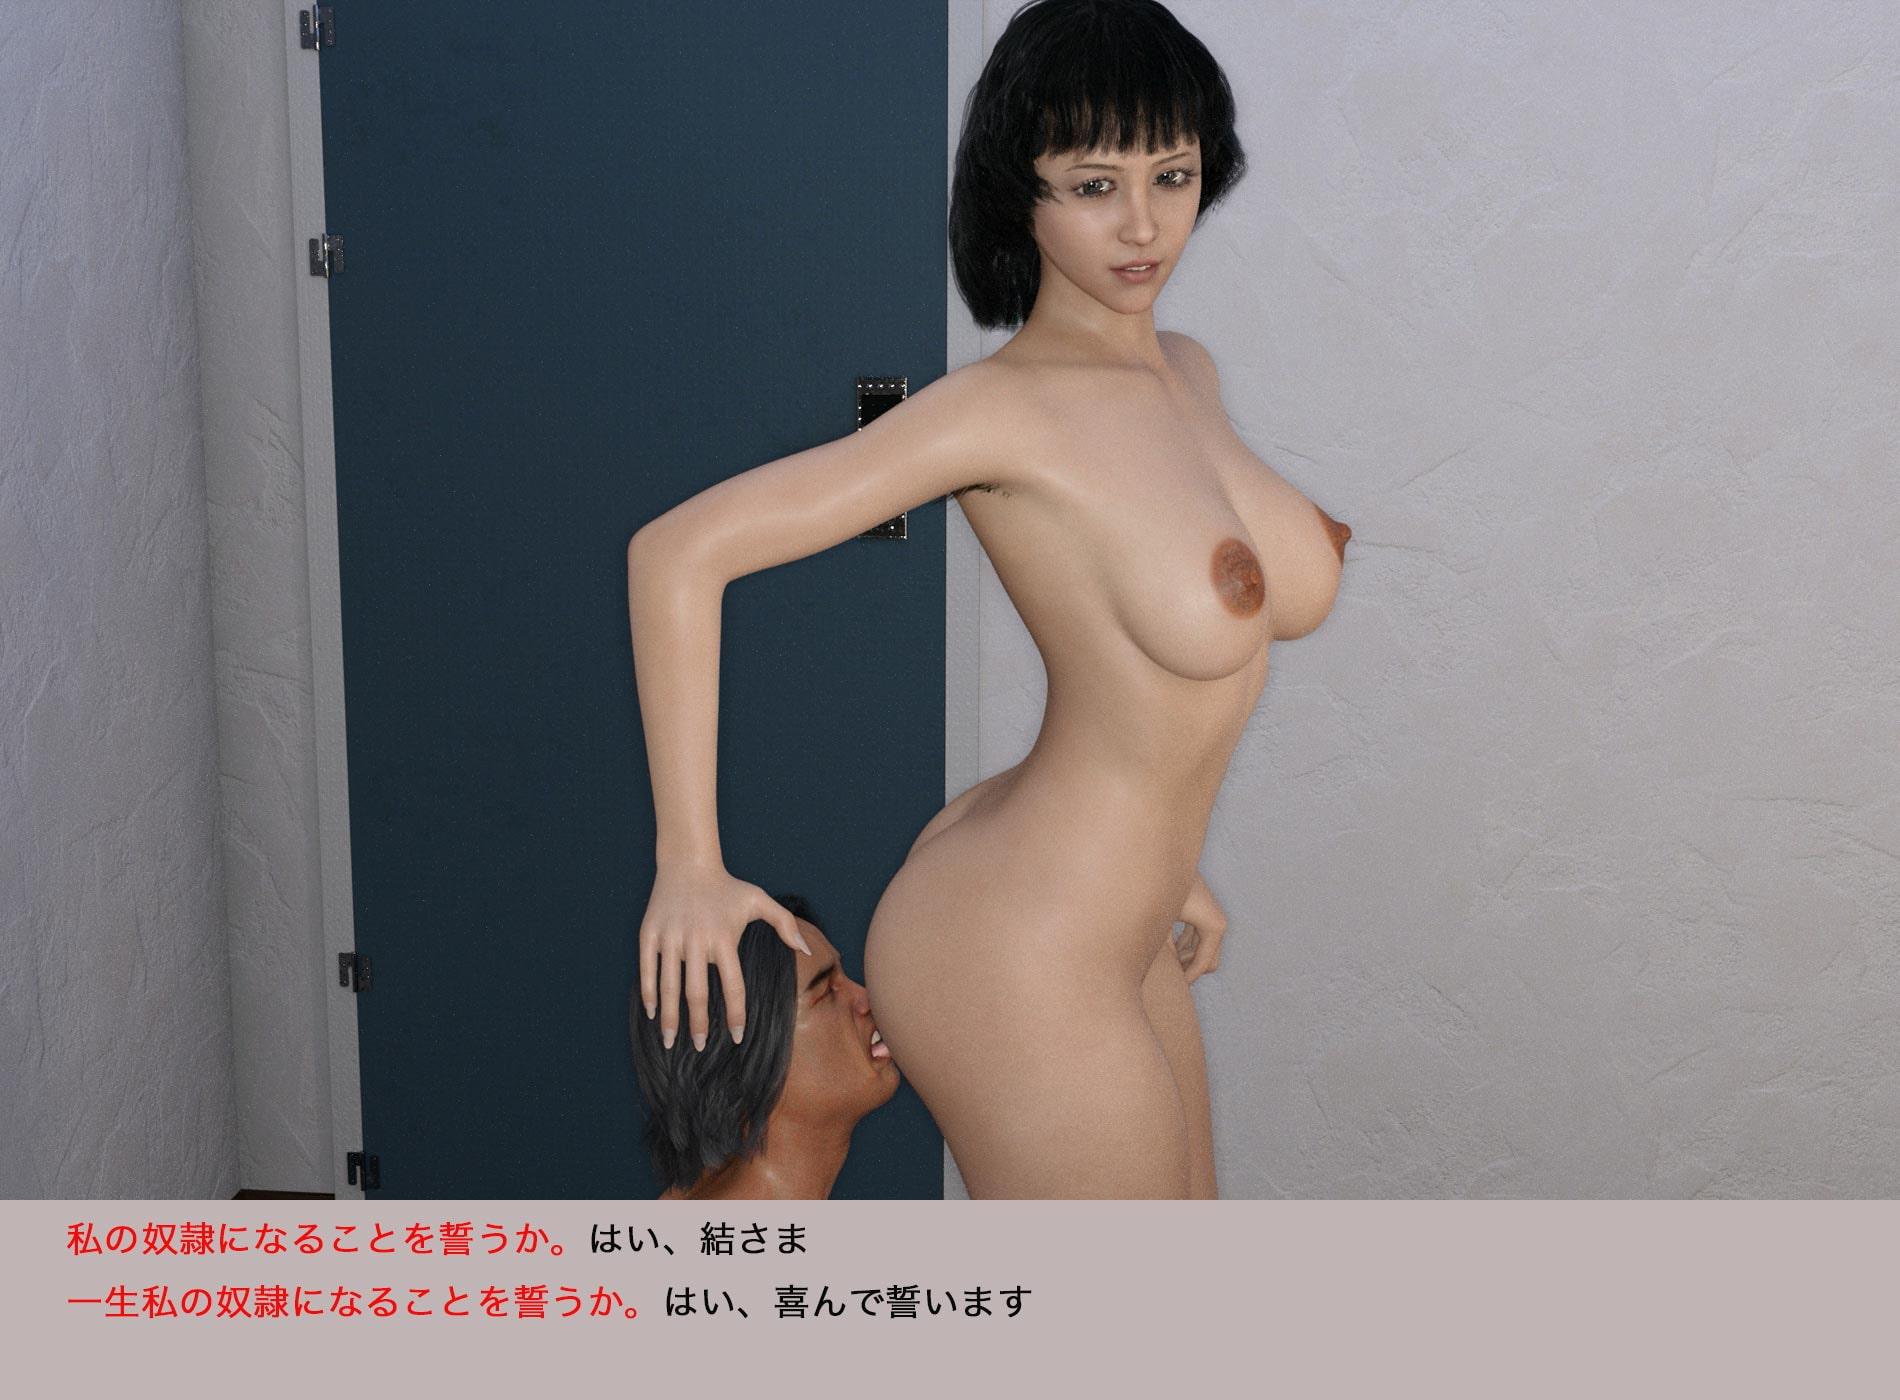 女王様大好き 01-04 総集編